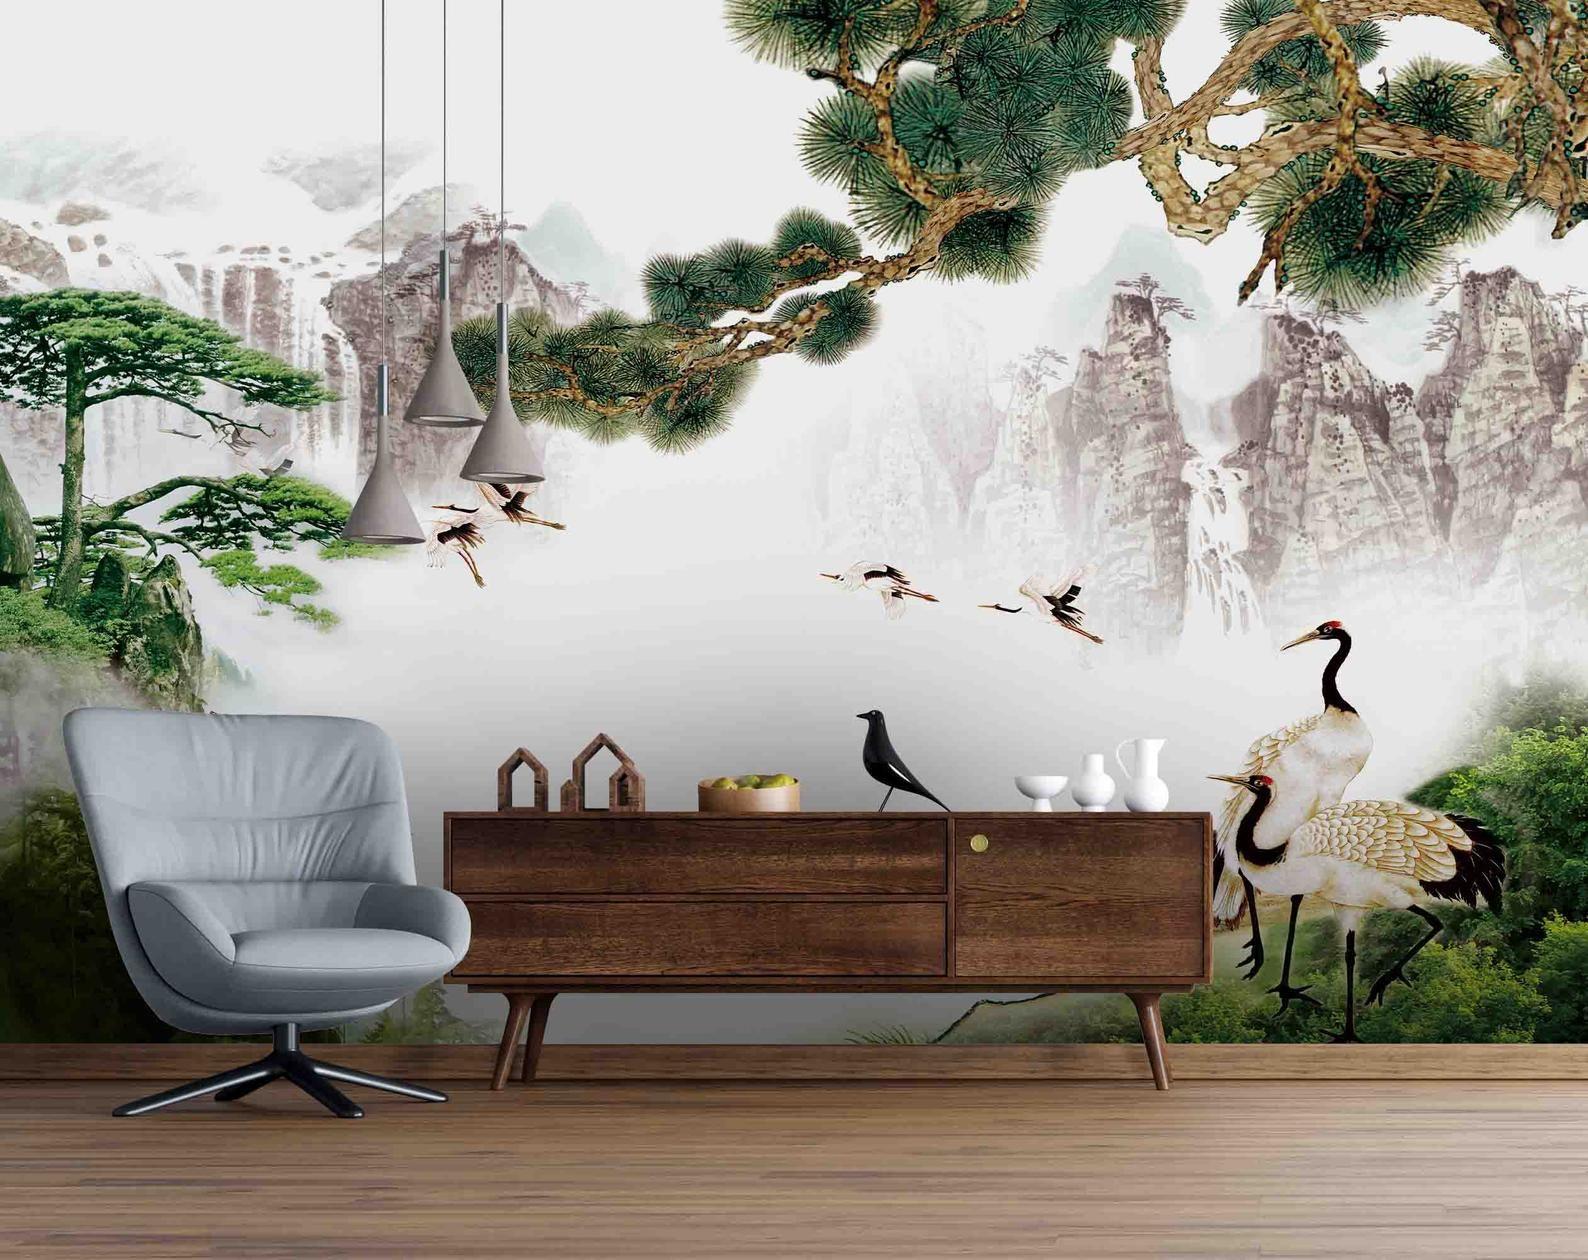 3d Chinese White Crane Pine Tree Wallpaper Mural Peel And Etsy Tree Wallpaper Mural Tree Wallpaper Mural Wallpaper